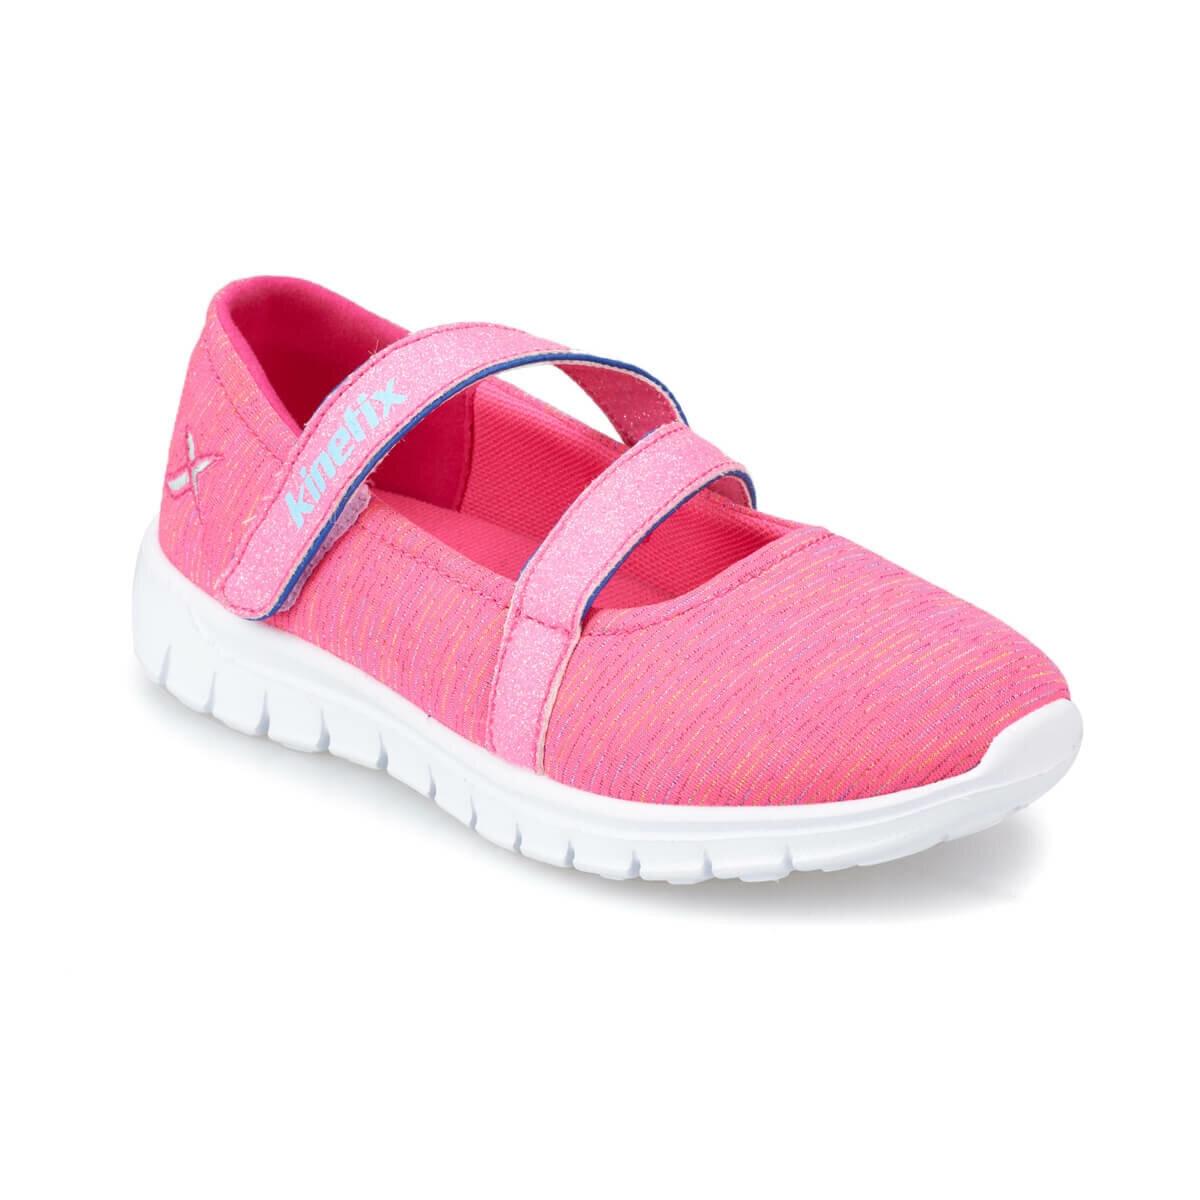 FLO LESTER Neon Pink Female Child Walking Shoes KINETIX